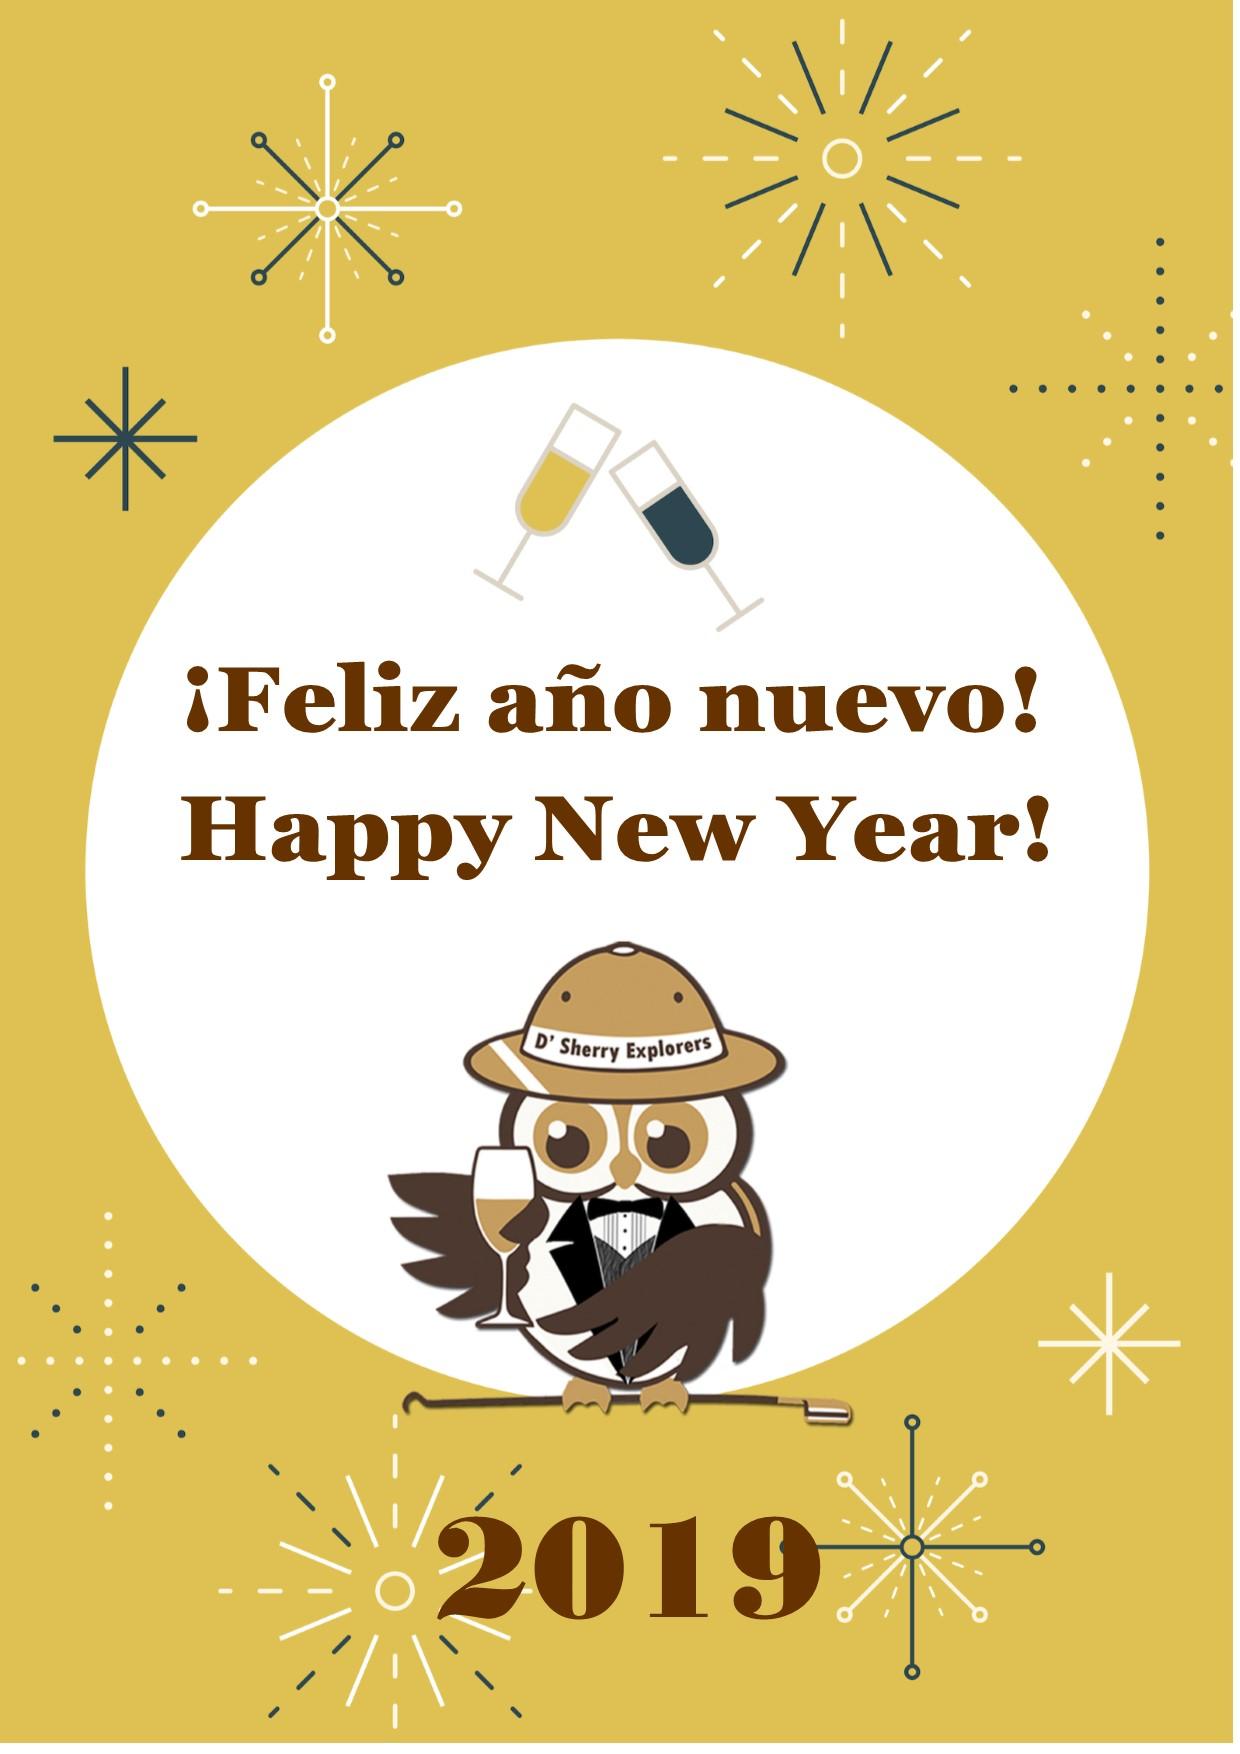 Happy New Year!  ¡Feliz añonuevo!